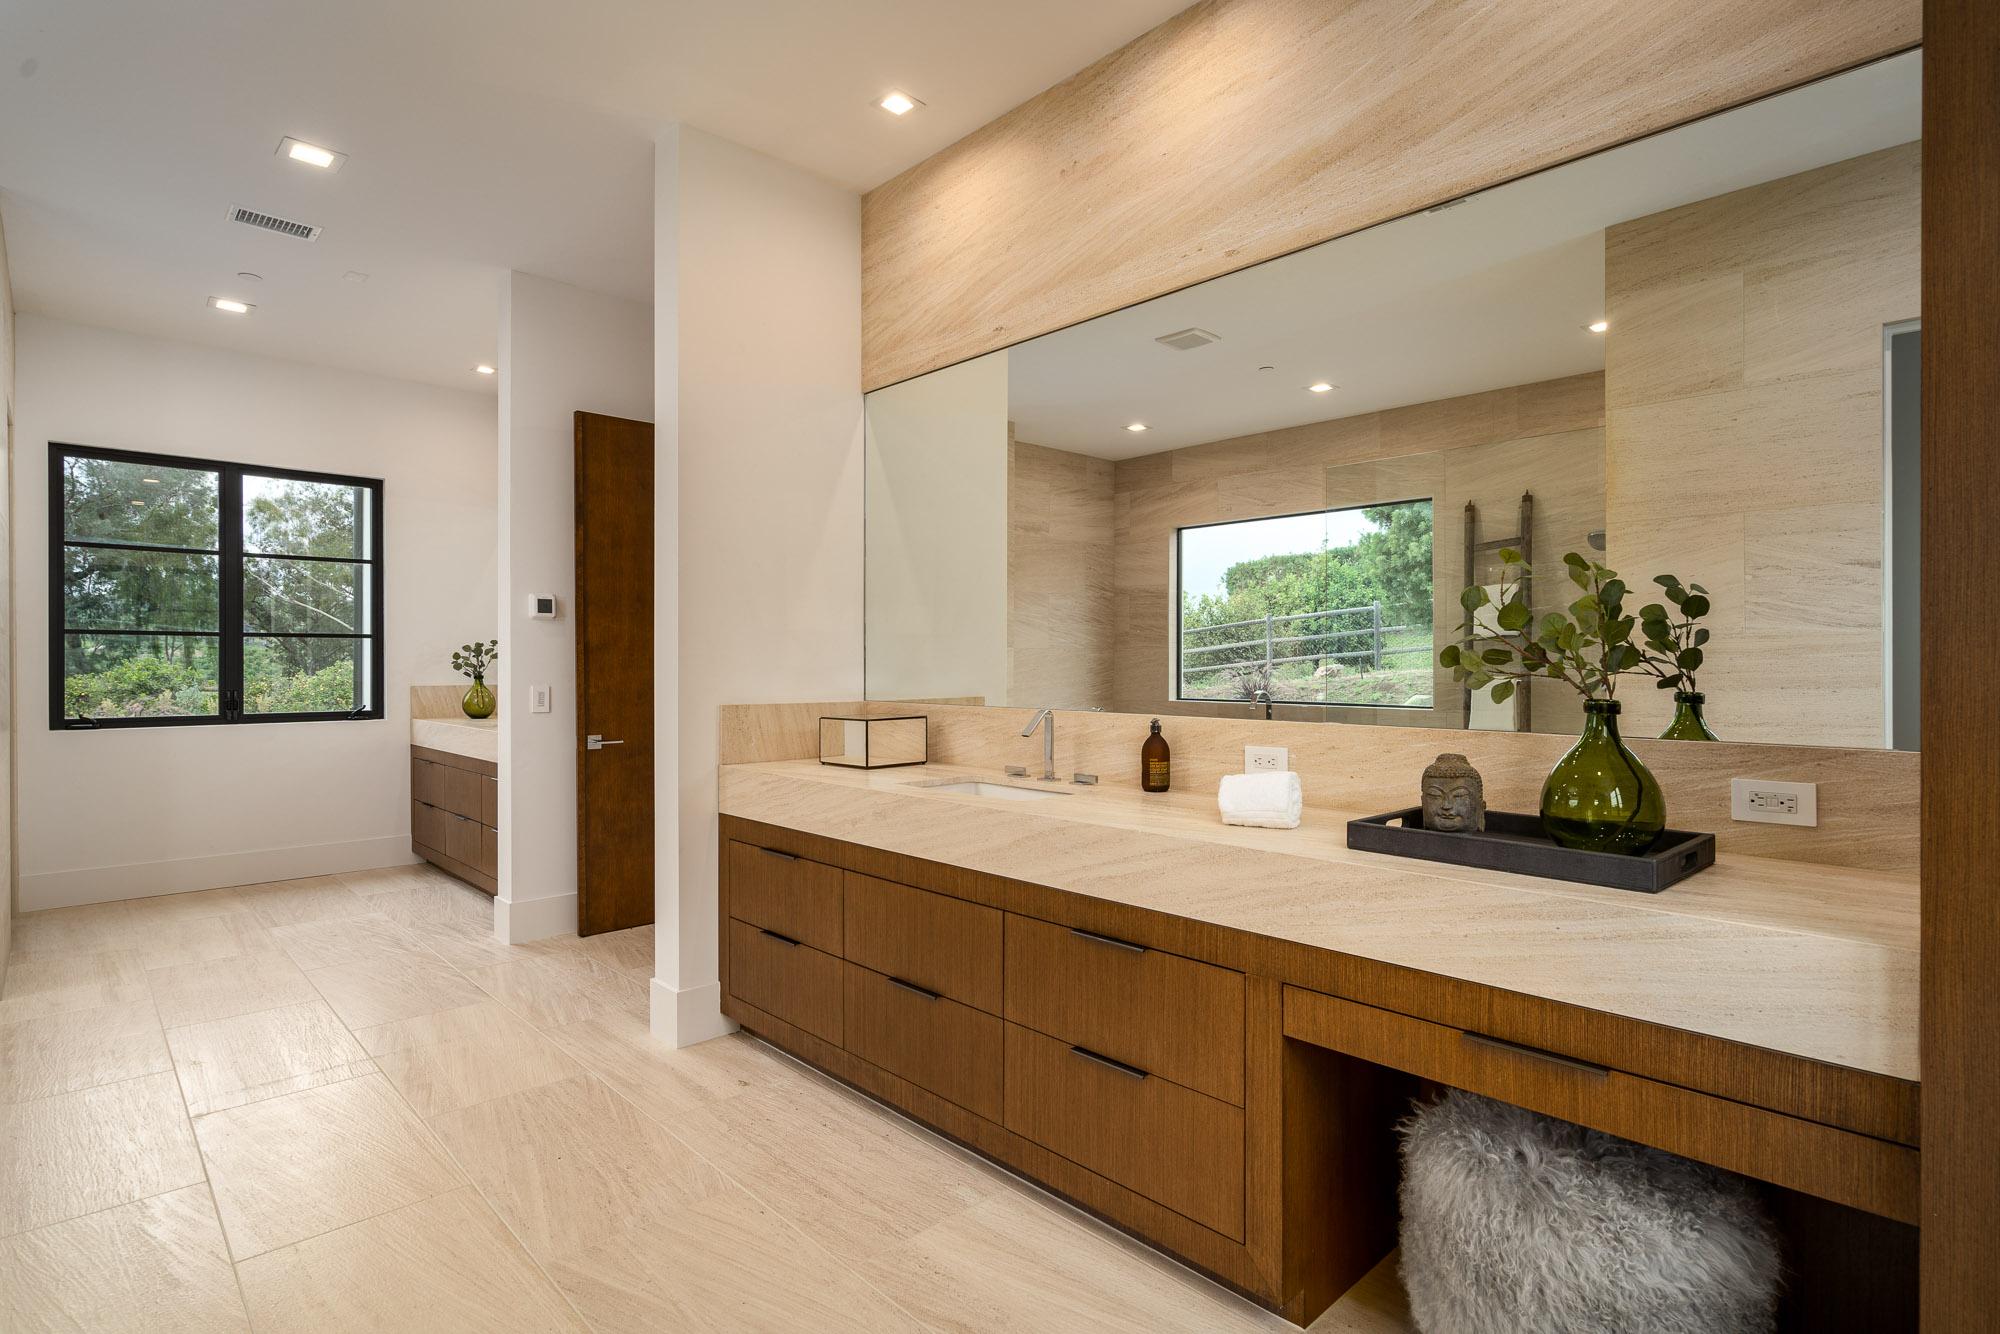 Sold 2020 Represented Buyer & Seller -  Rancho Santa Fe, CA 92067